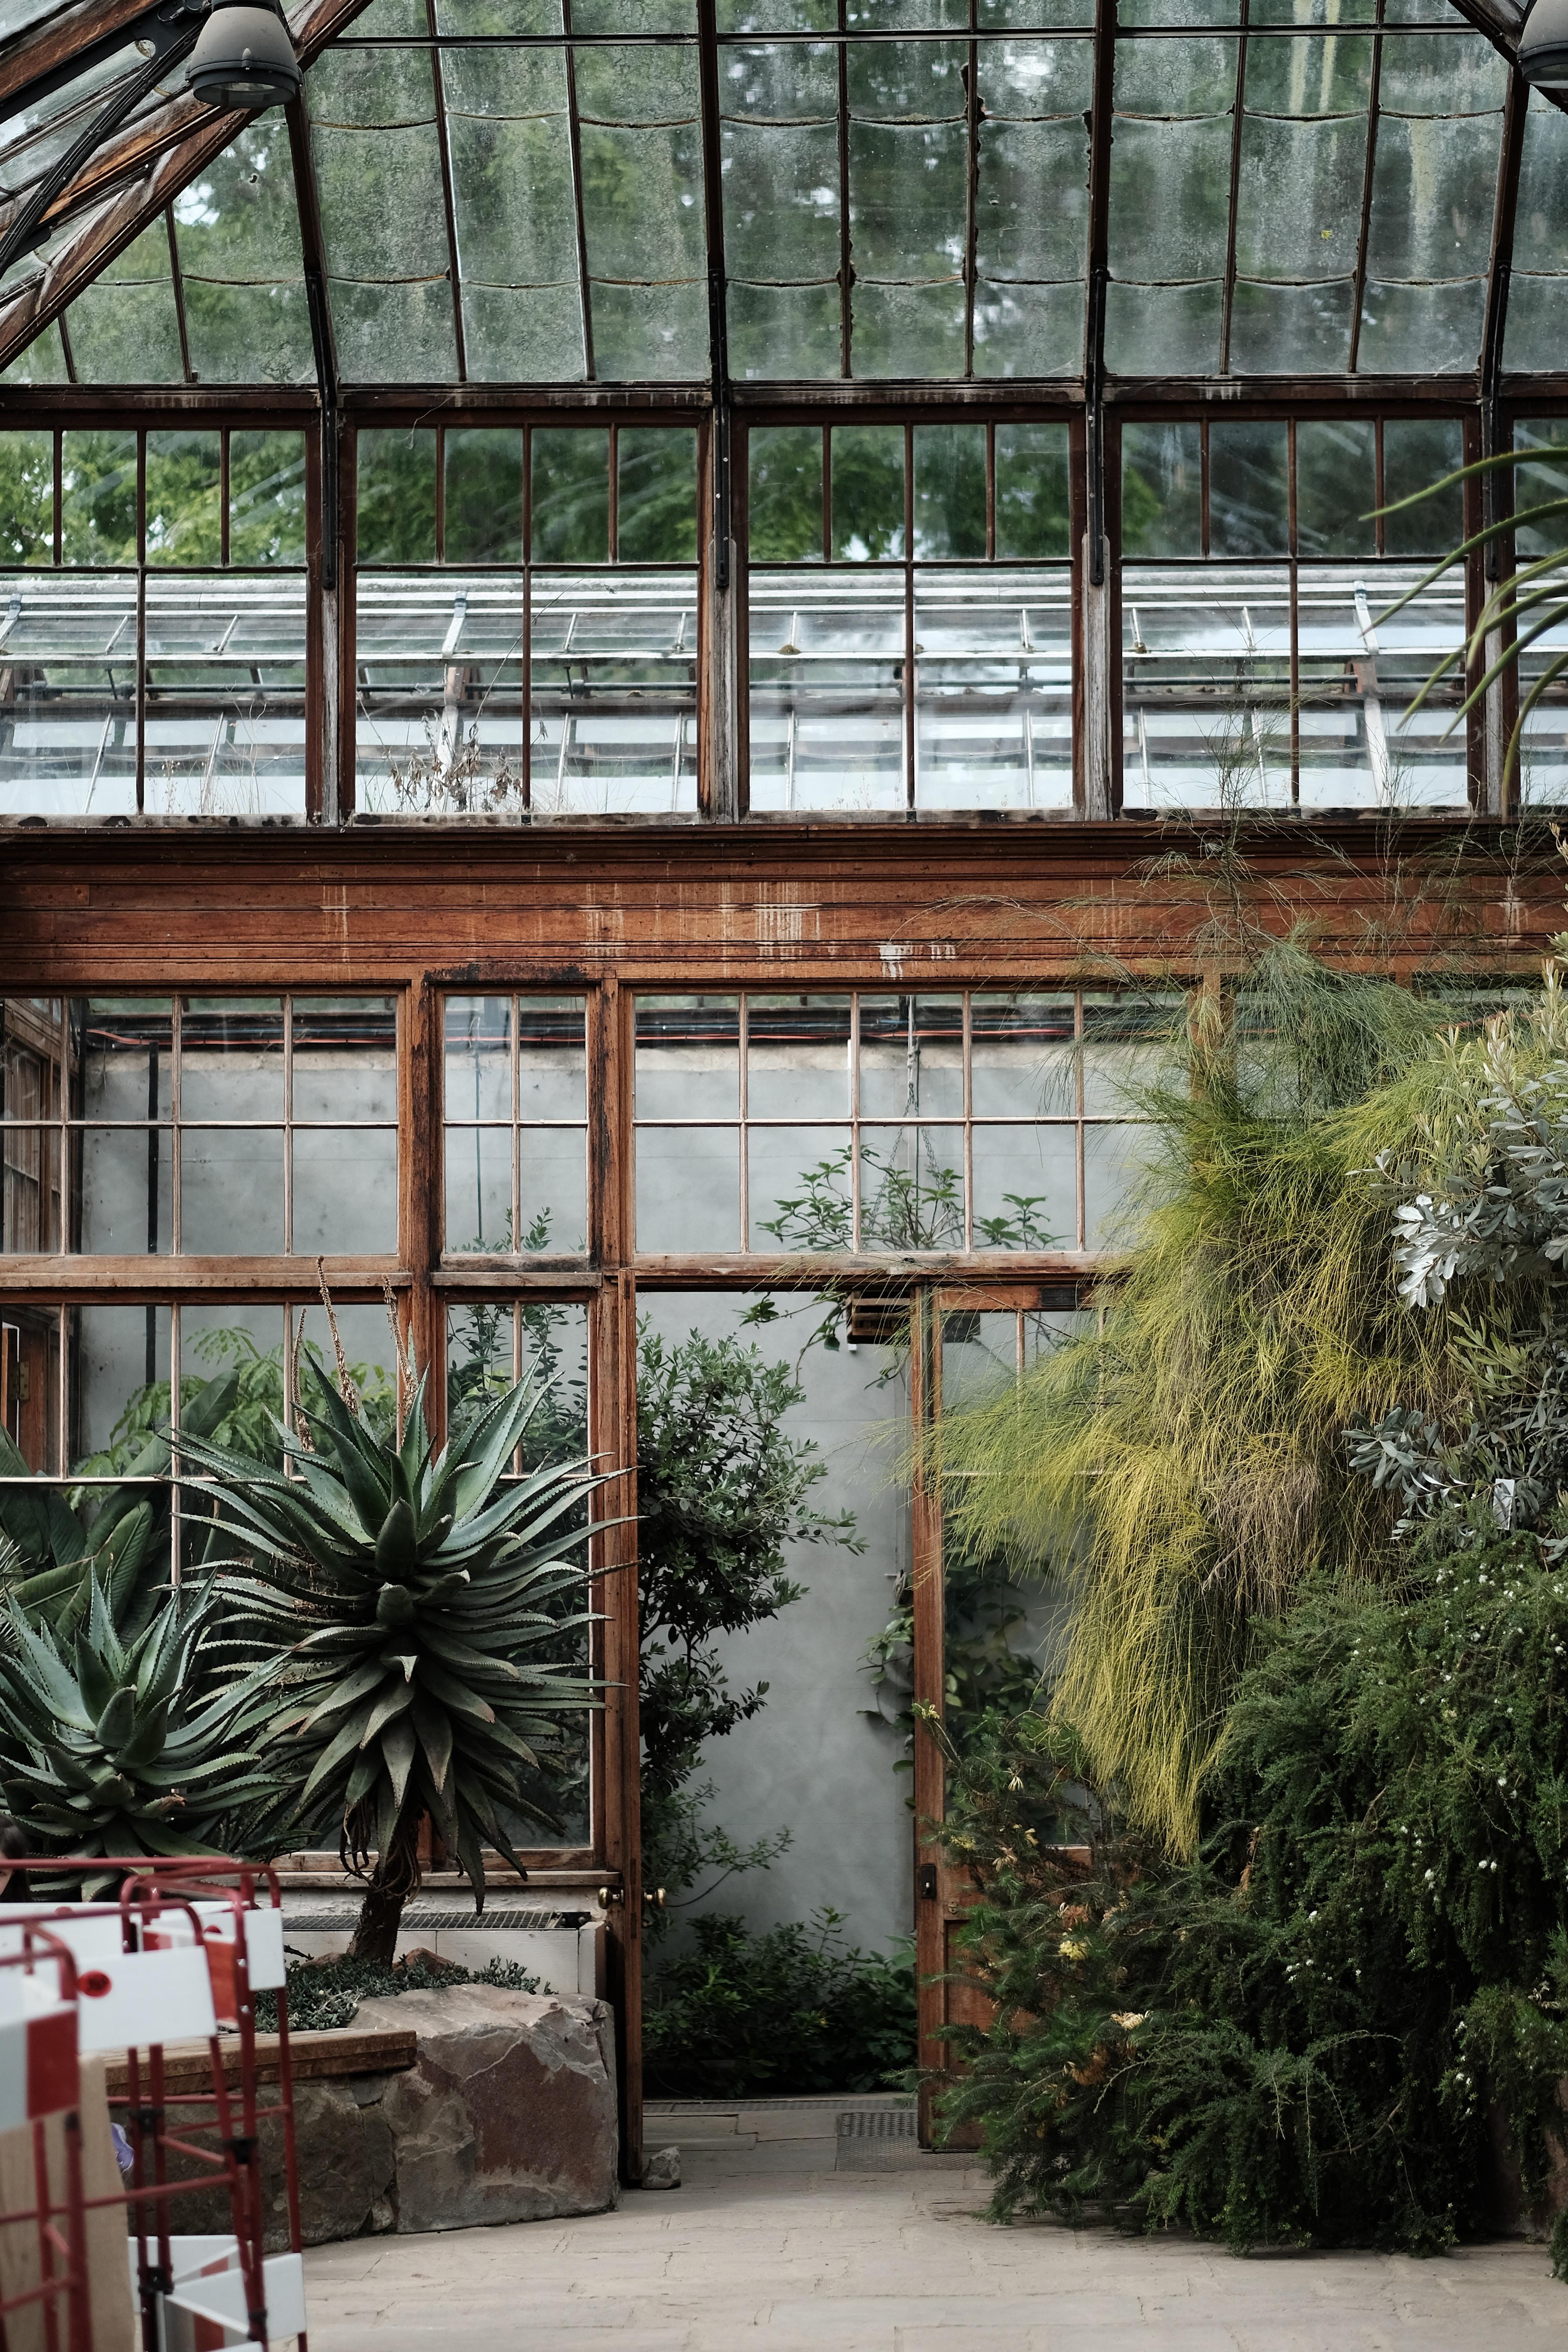 An inside look at a glass house garden in Cambridge Botanic Garden Hills Road Entrance